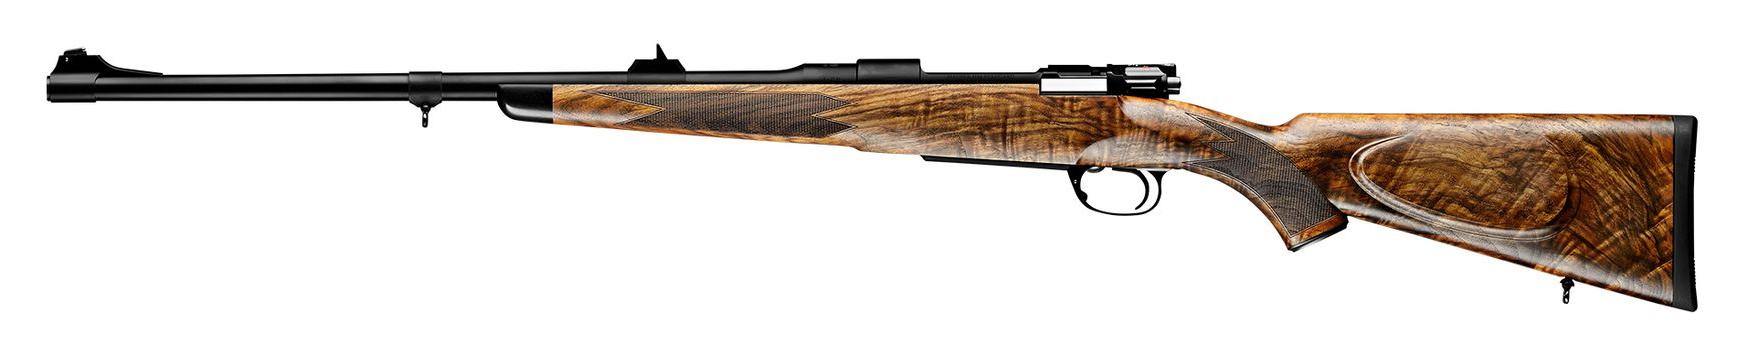 Mauser M98 Diplomat rifle